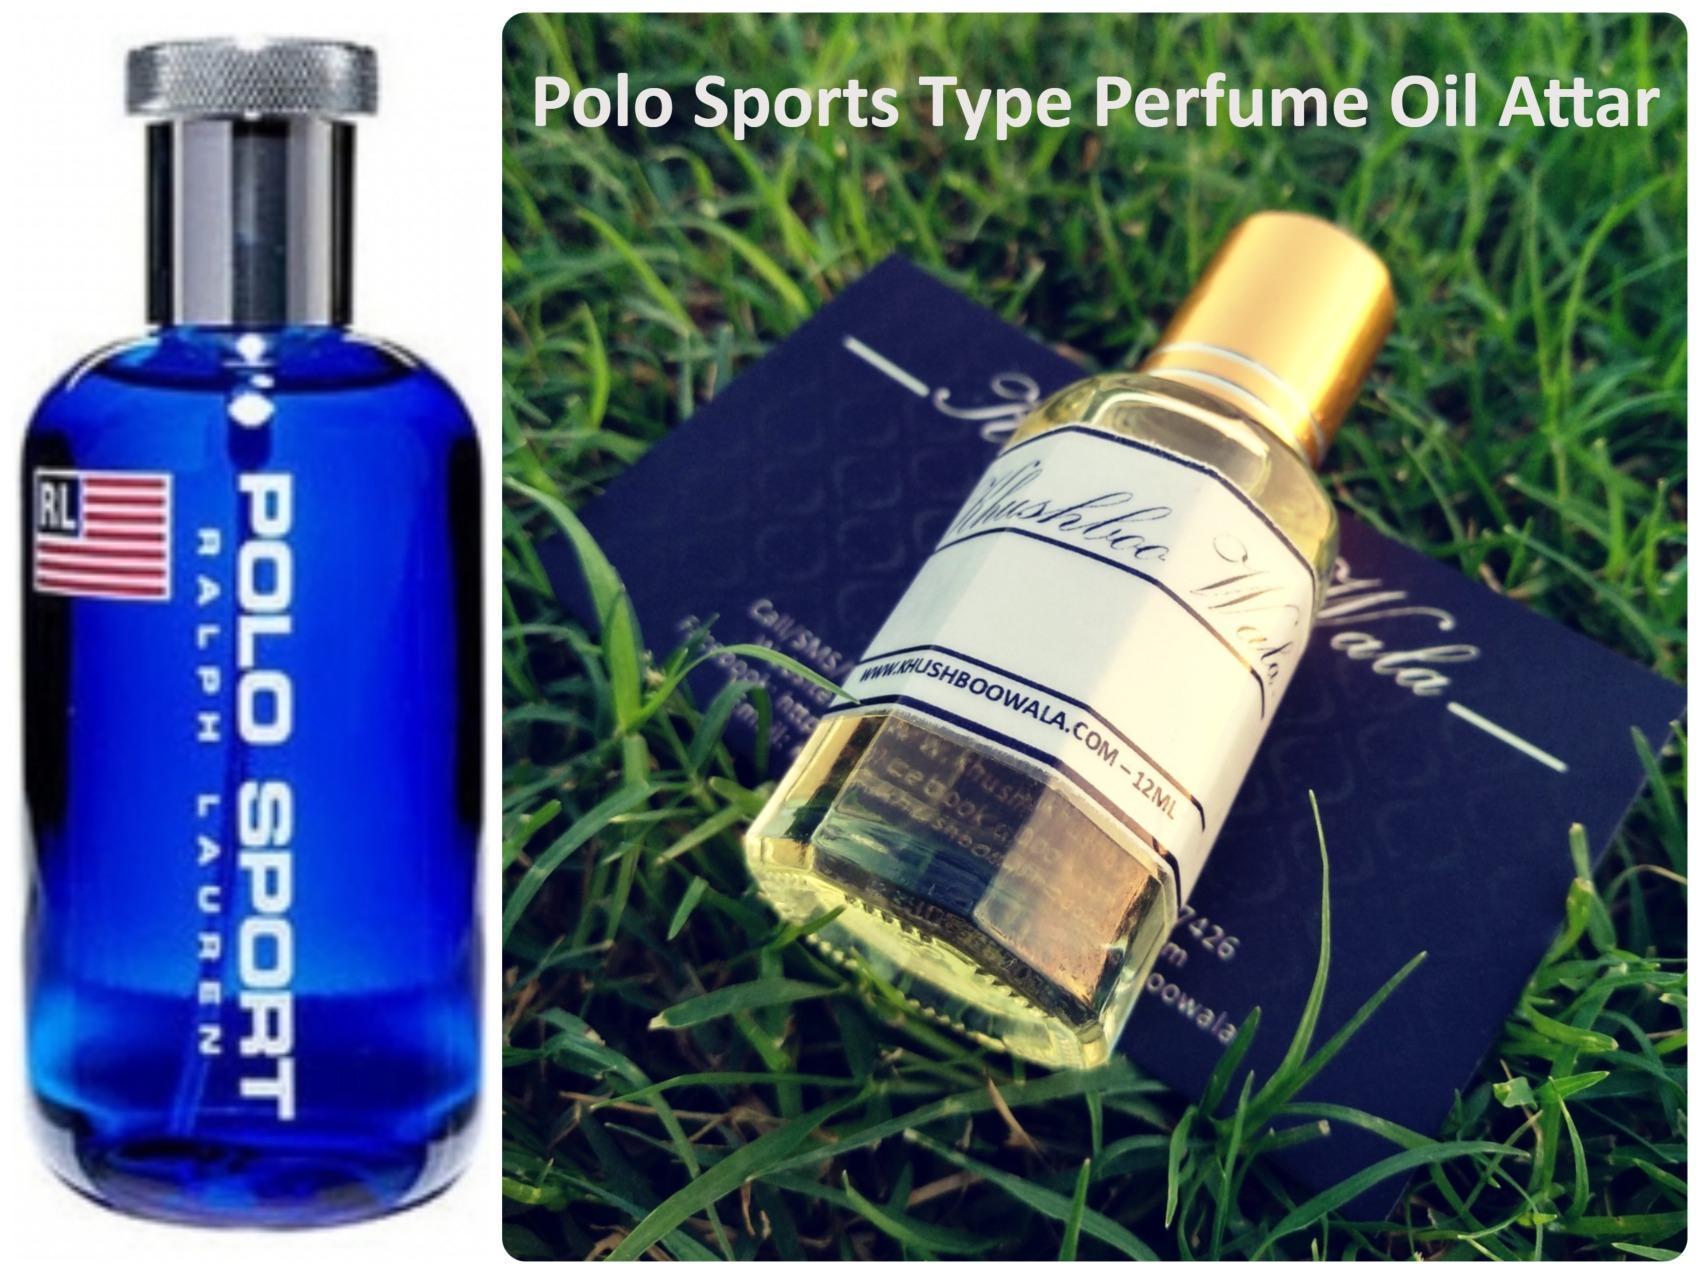 bd5df6232 Polo sport type perfume oil attar buy online at best prices jpg 1700x1274  Sport parfum polo